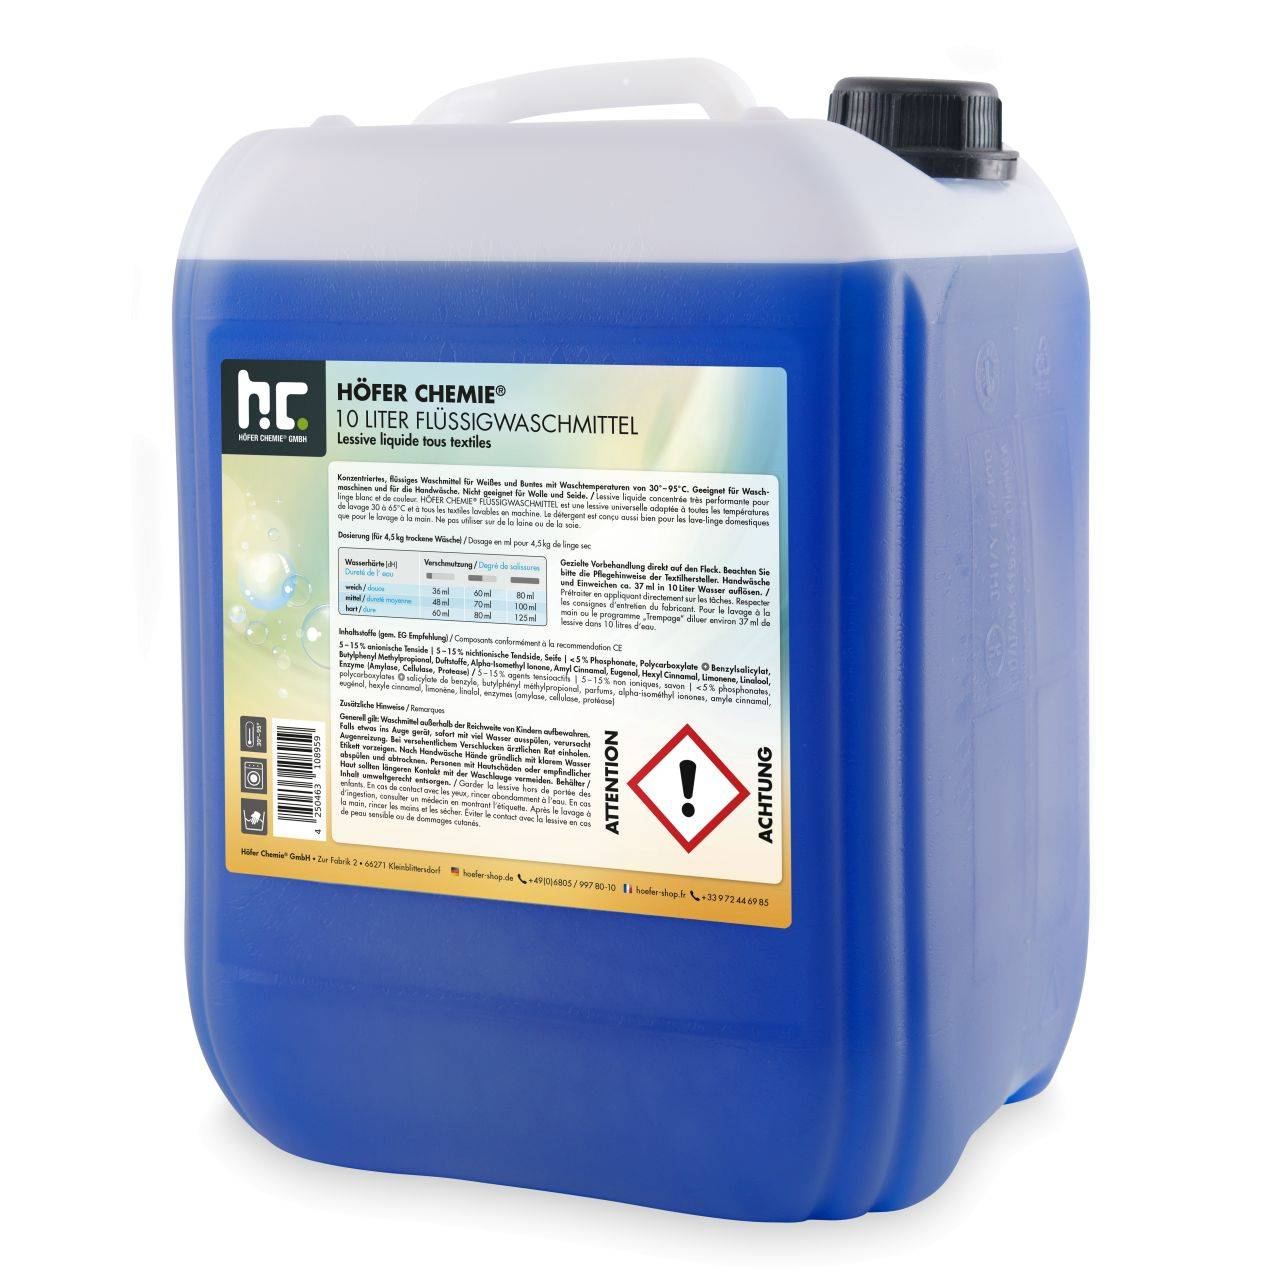 Höfer Chemie 20 l Lessive liquide (2 x 10 l)